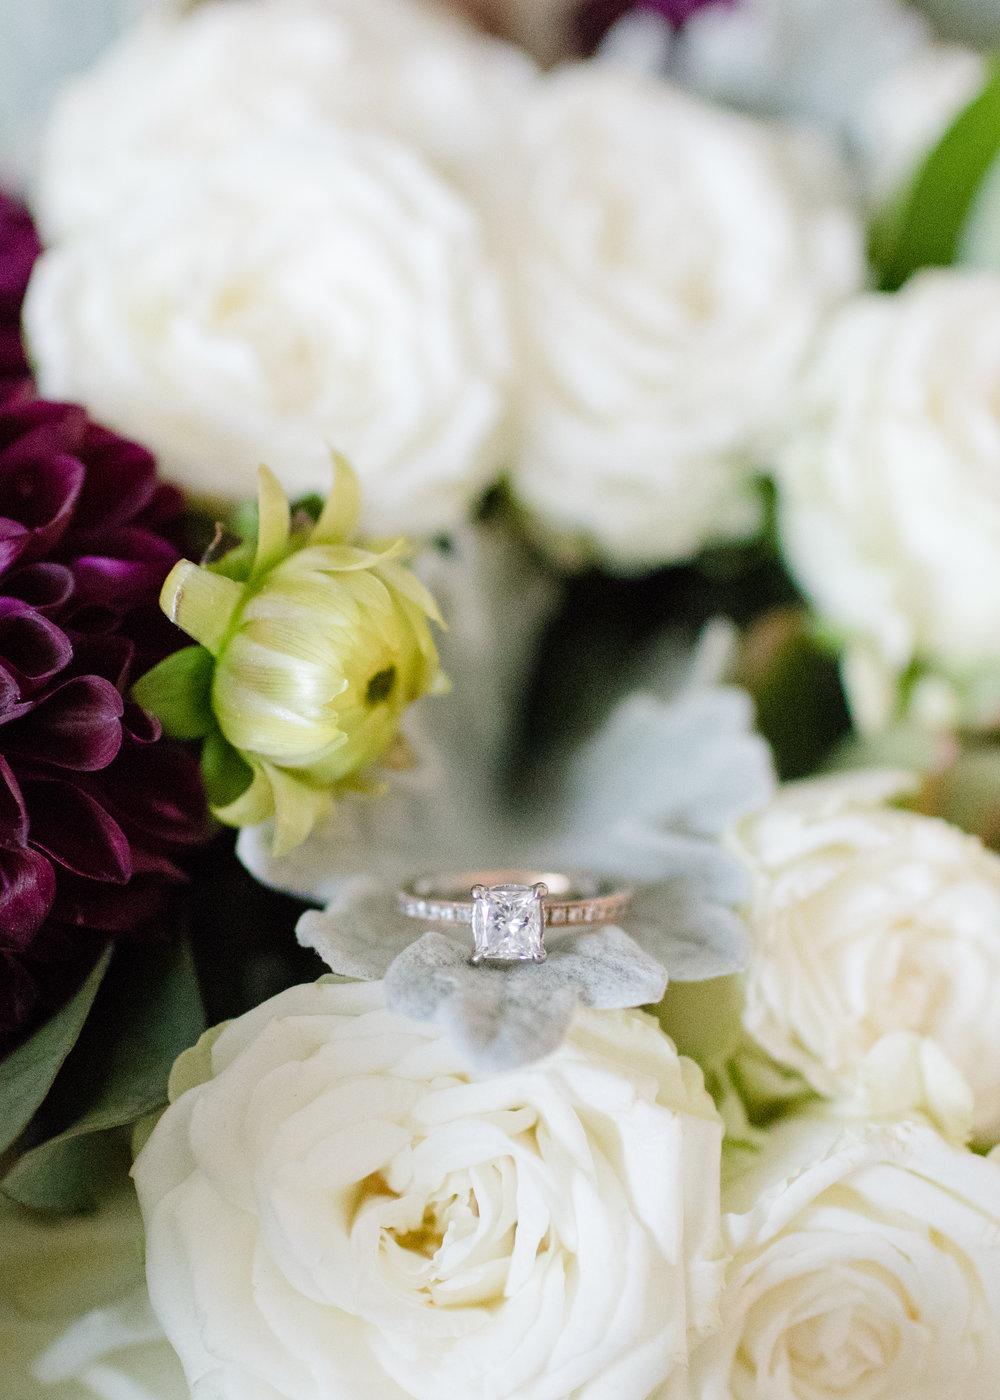 katherine_beth_photography_san_diego_wedding_photographer_the_venue_eastlake_chula_vista_wedding_the_knot_san_diego_017.jpg